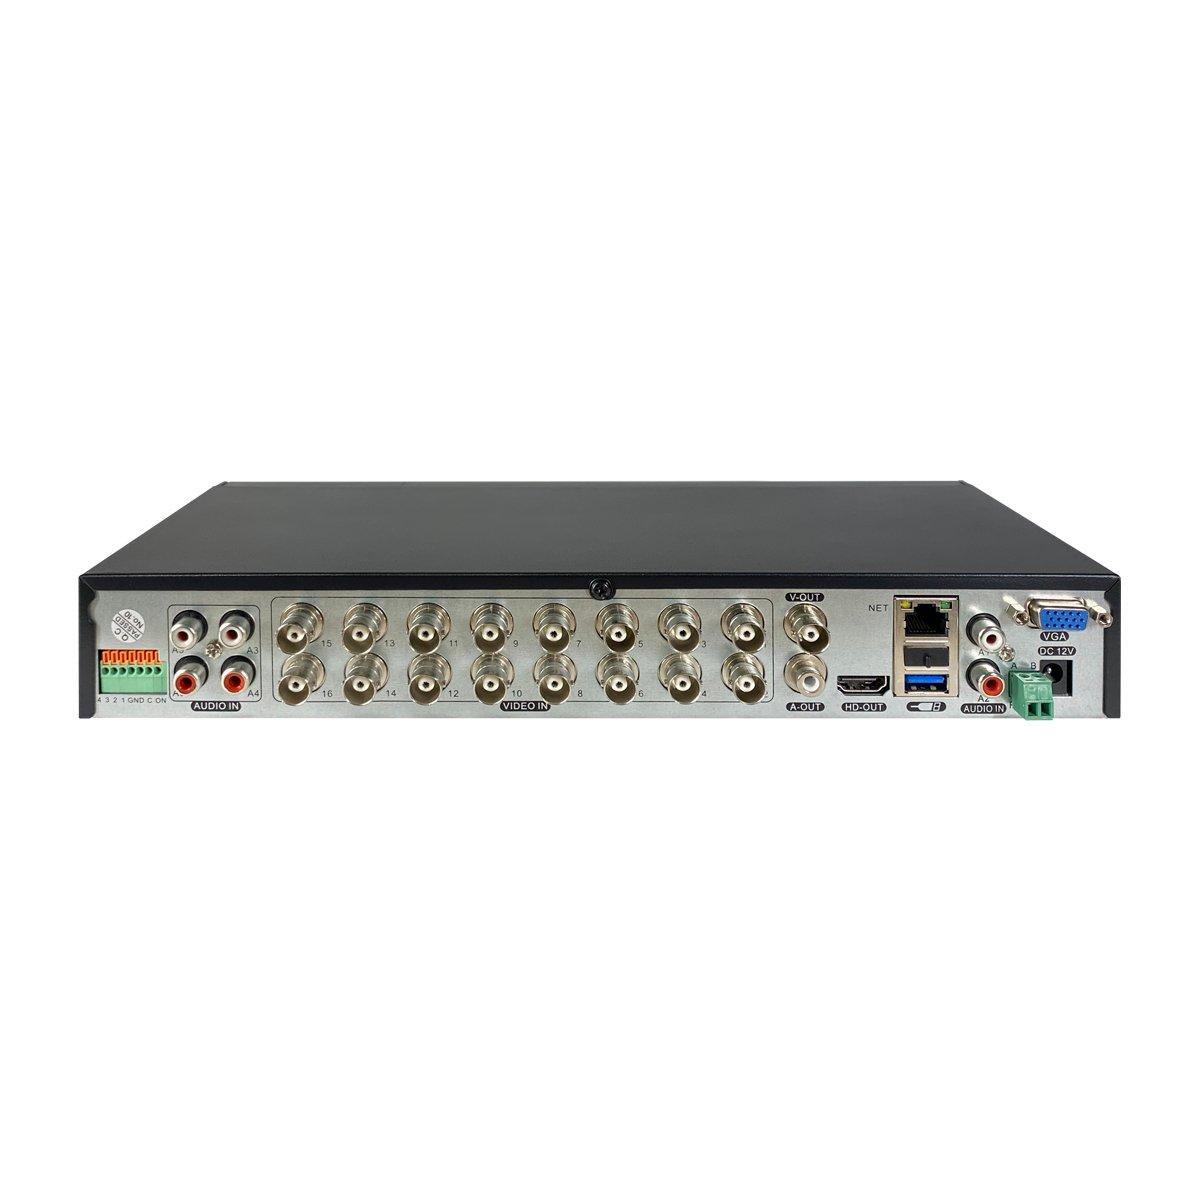 XVR 4K Ibrido 5in1 16 Canali - Intelligenza Artificiale - 4 Ingressi Allarme - Cloud